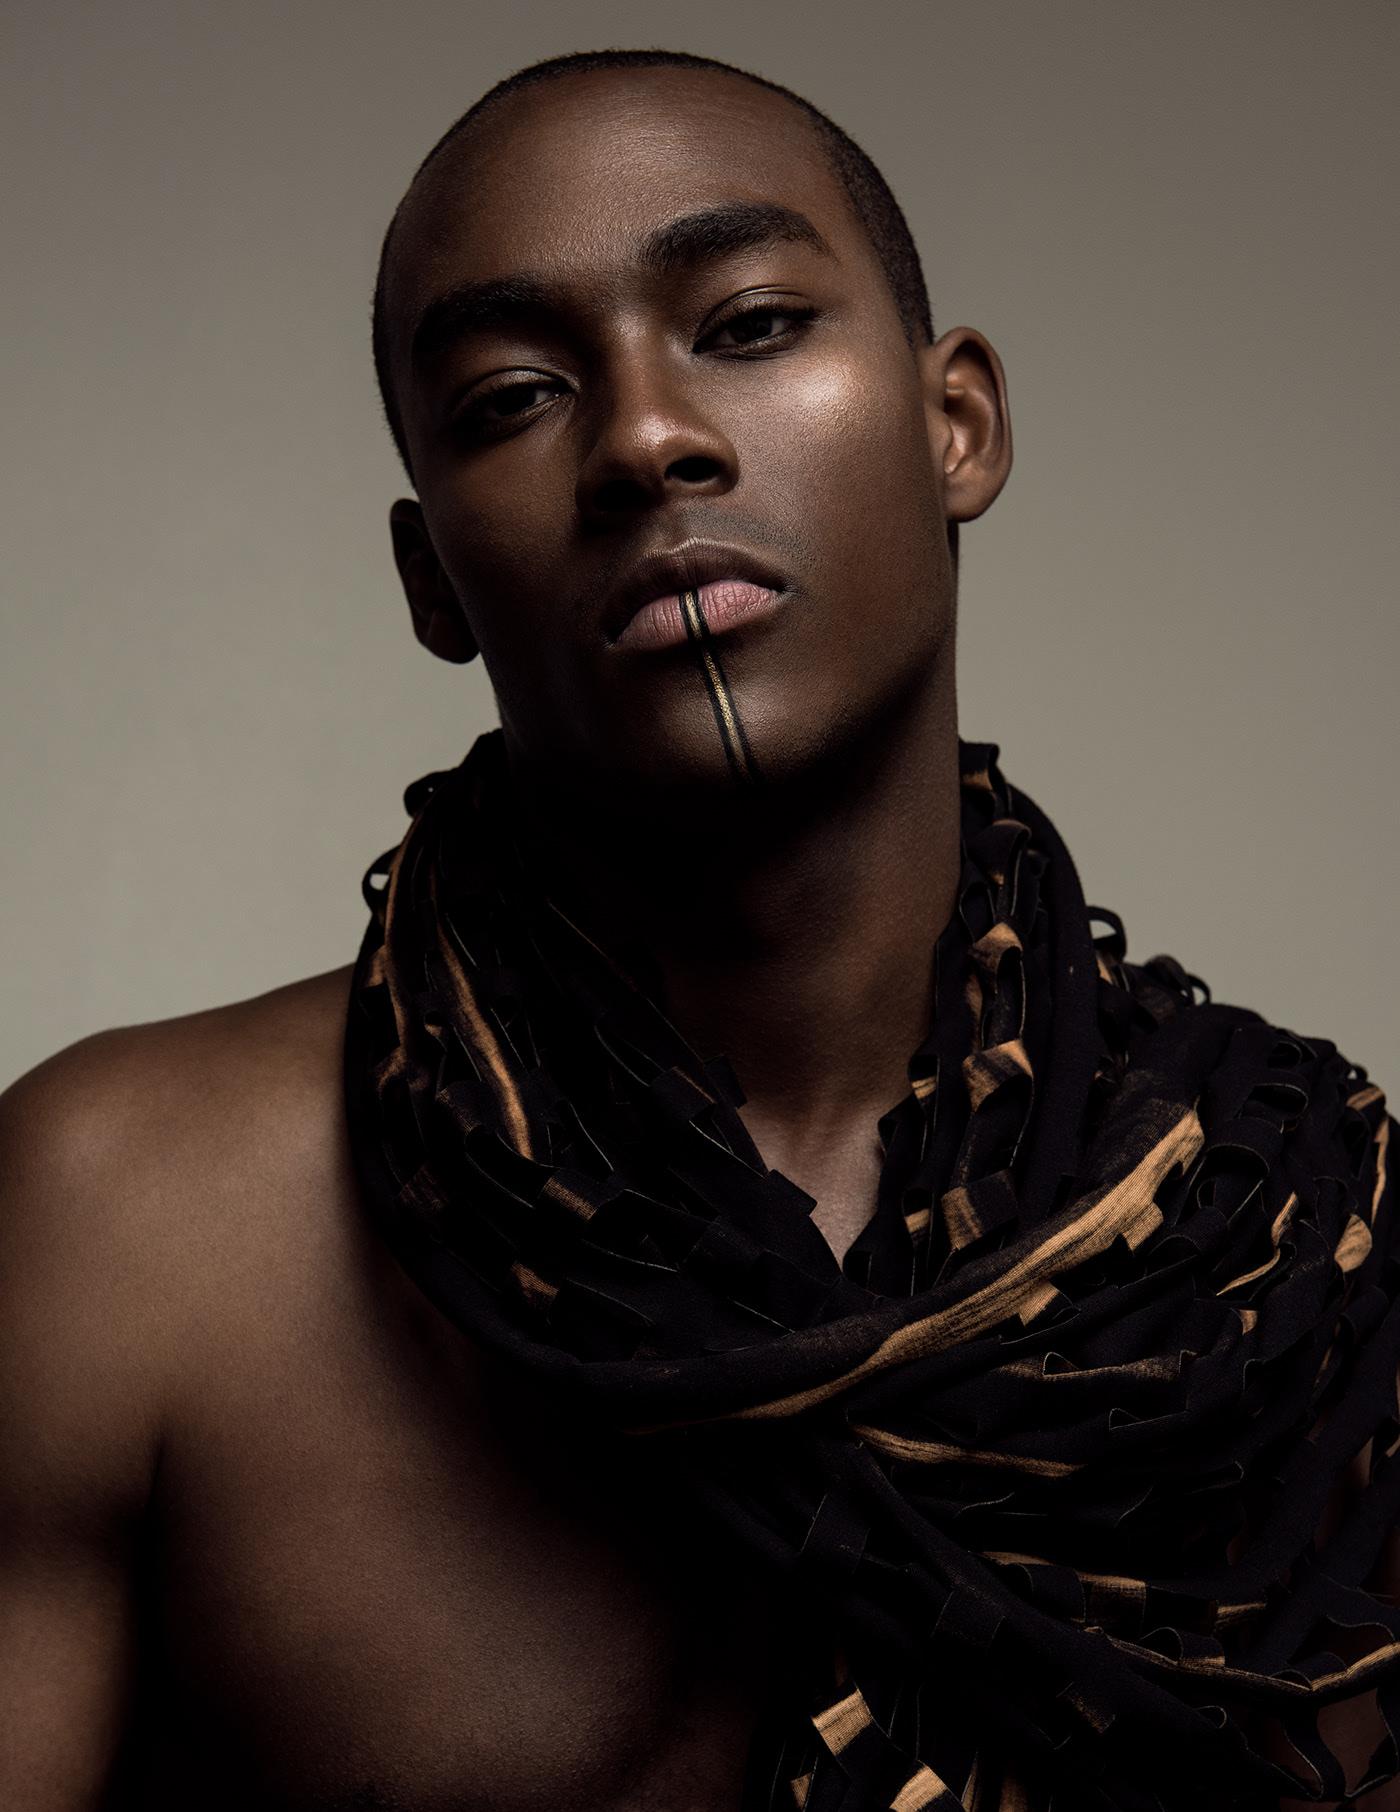 fashion photography man by alena saz